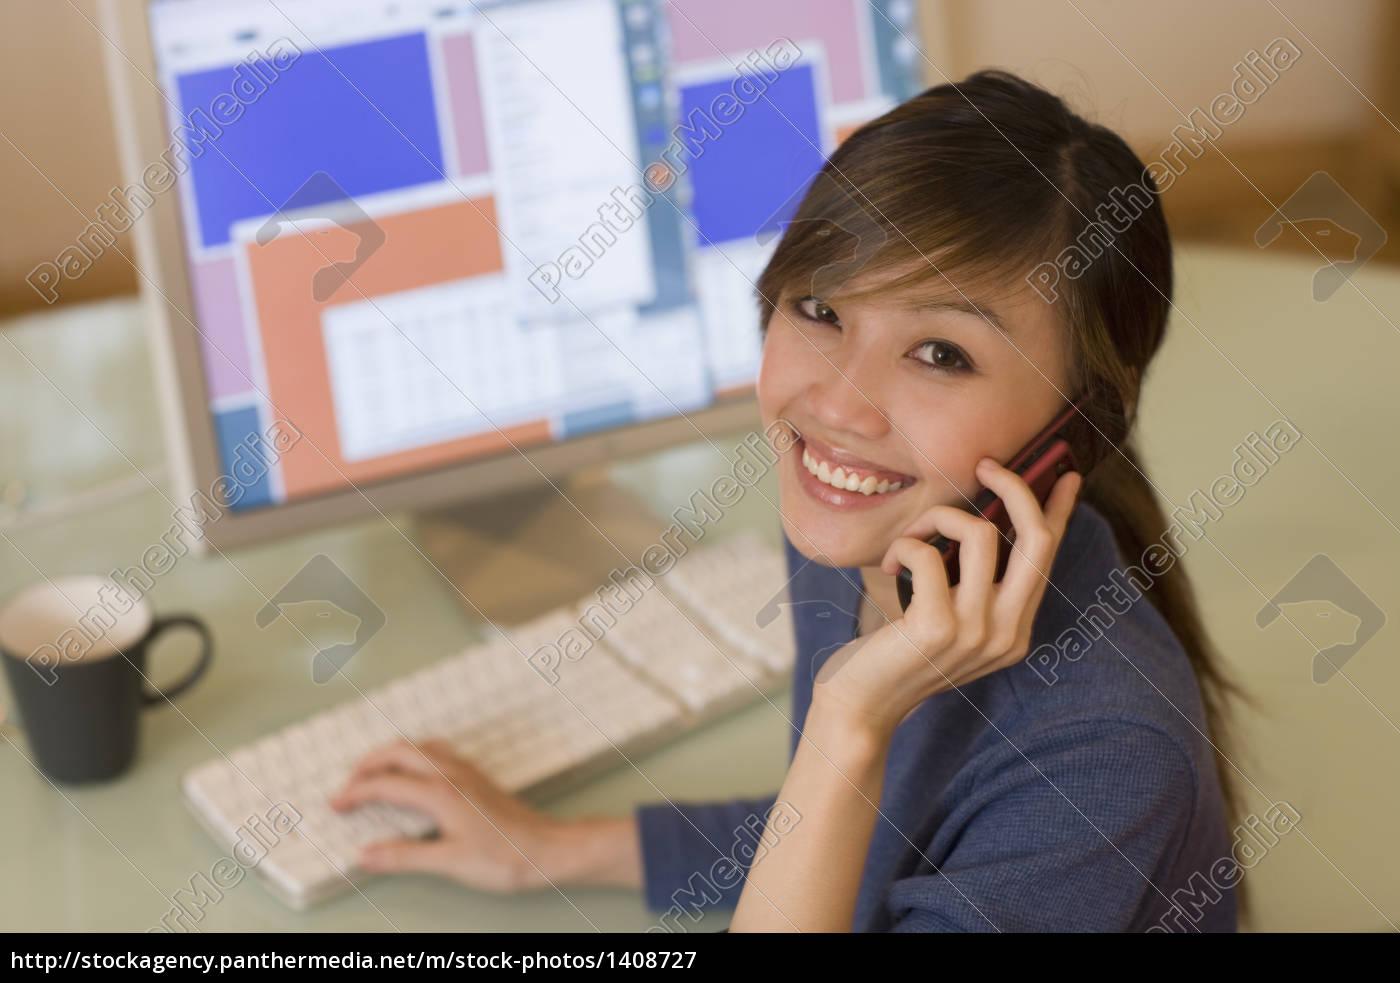 woman, office, beautiful, beauteously, nice, business dealings - 1408727